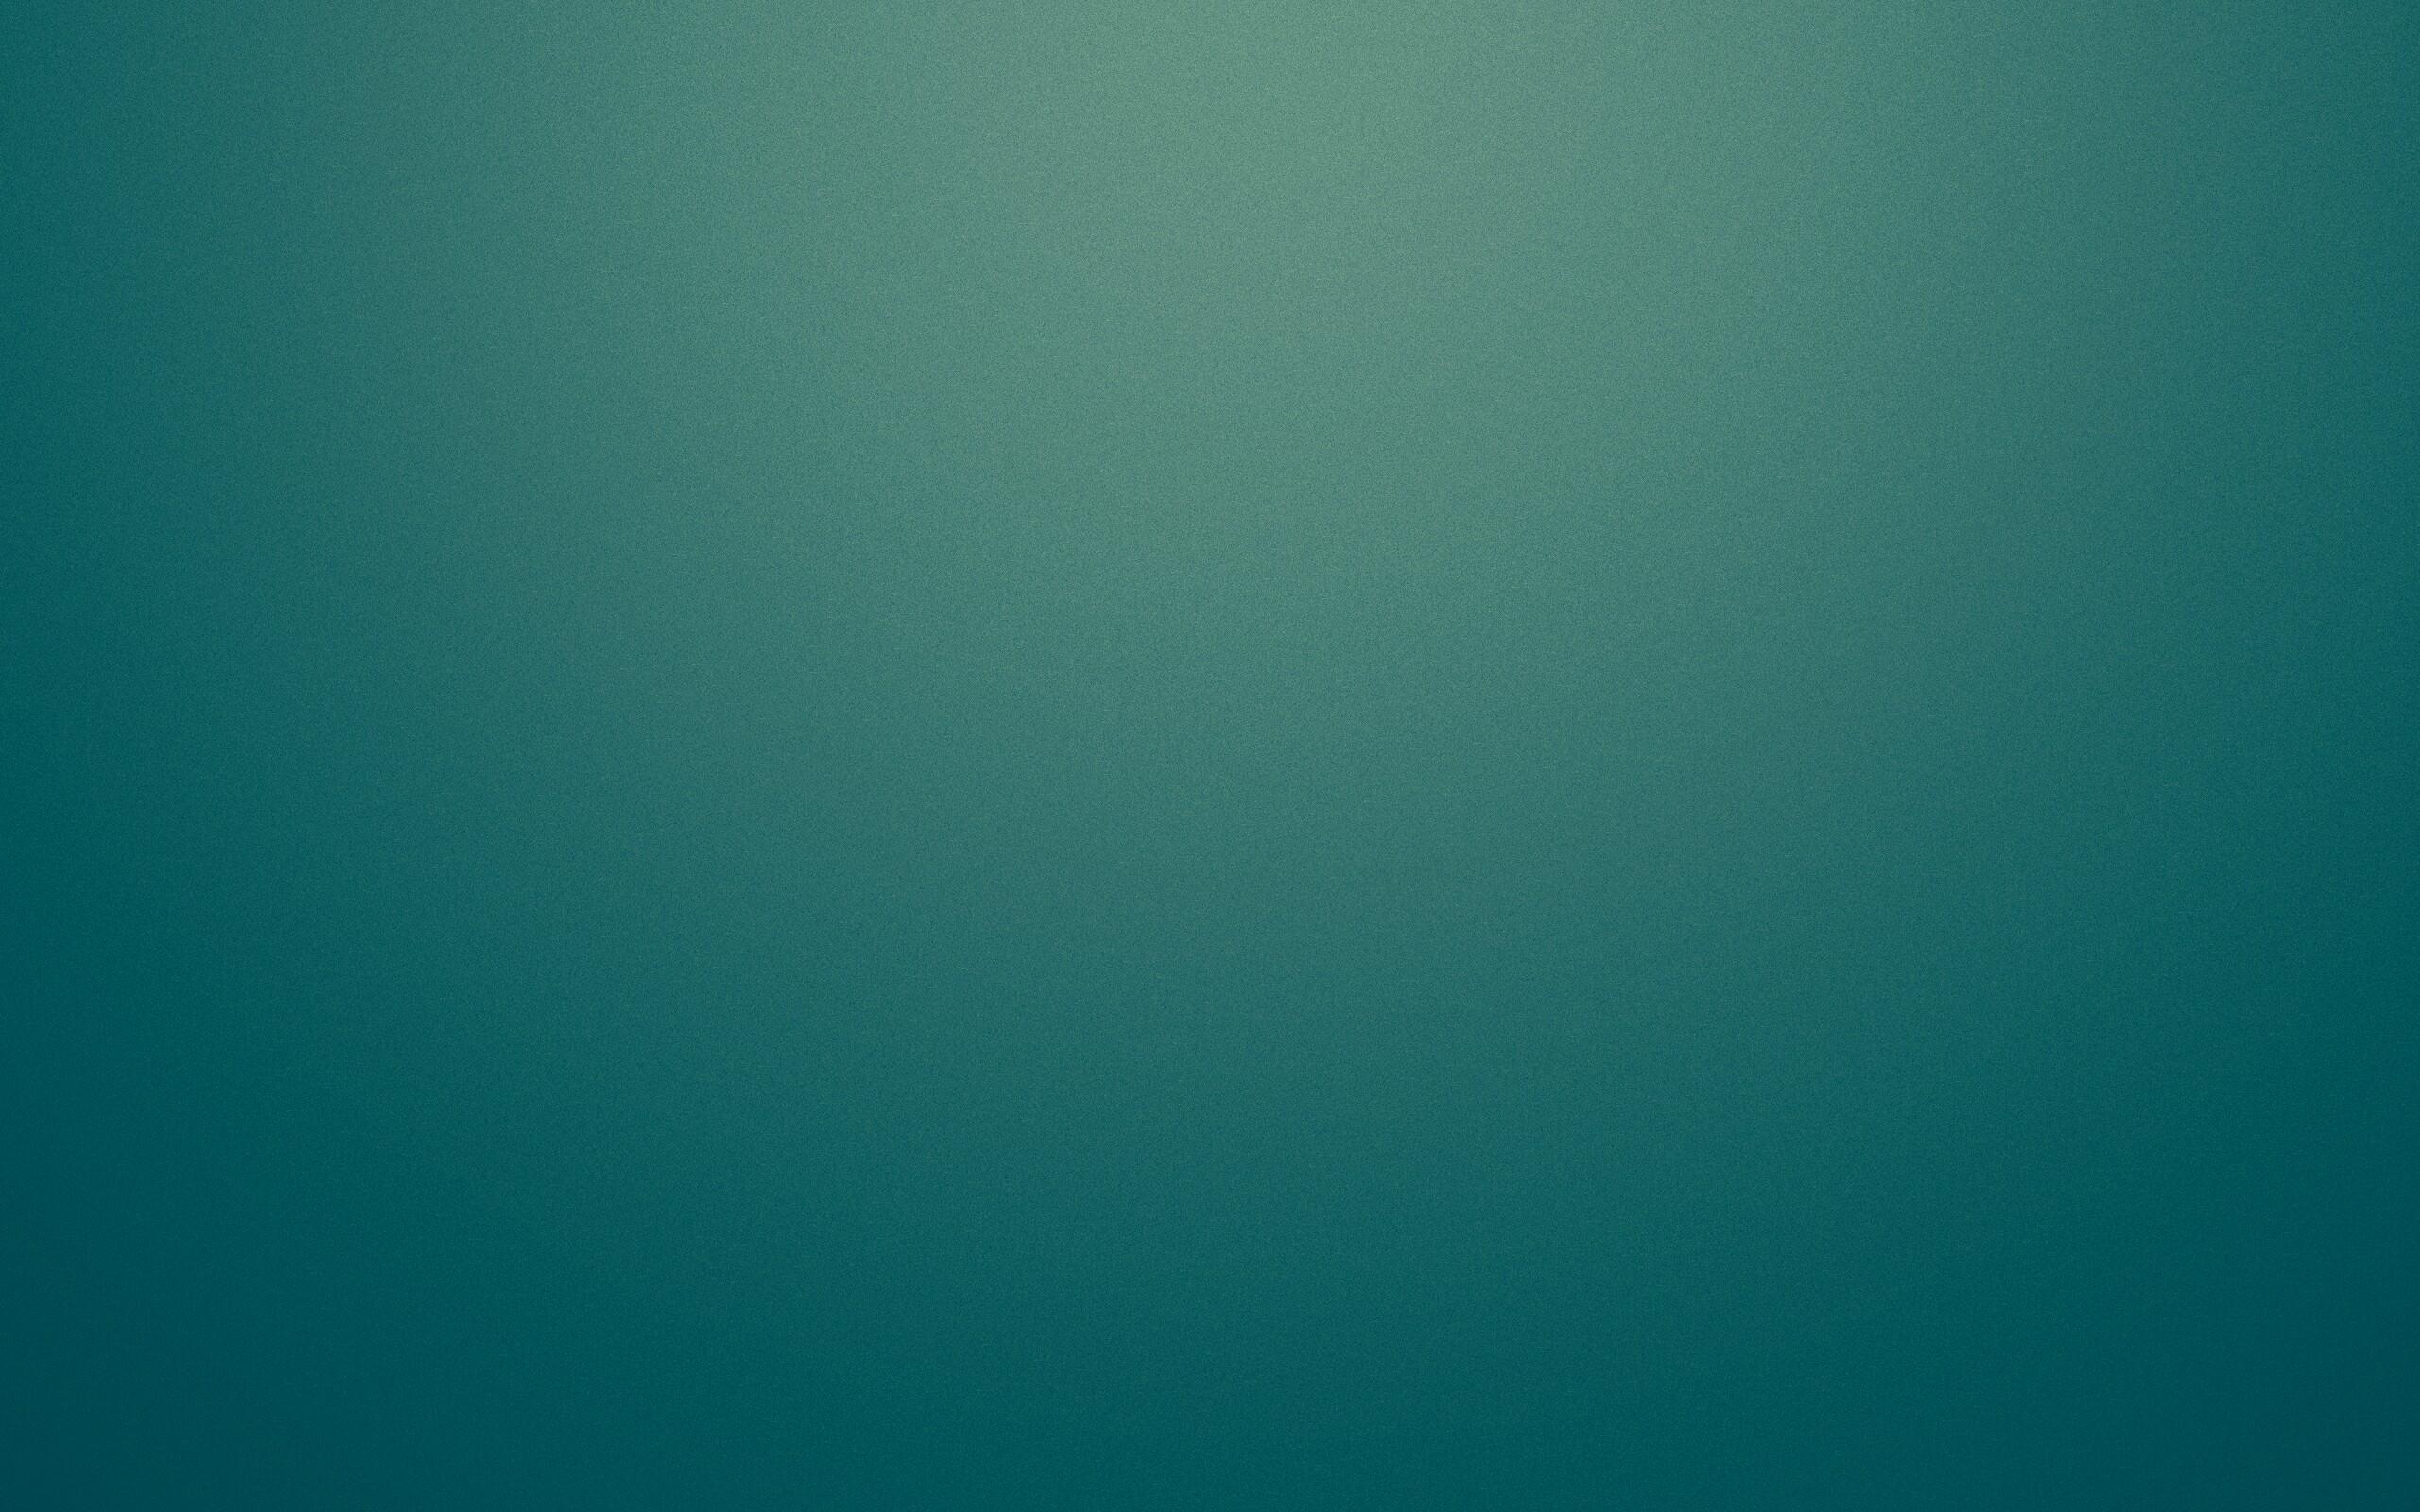 2560x1600px Flat Wallpapers Wallpapersafari